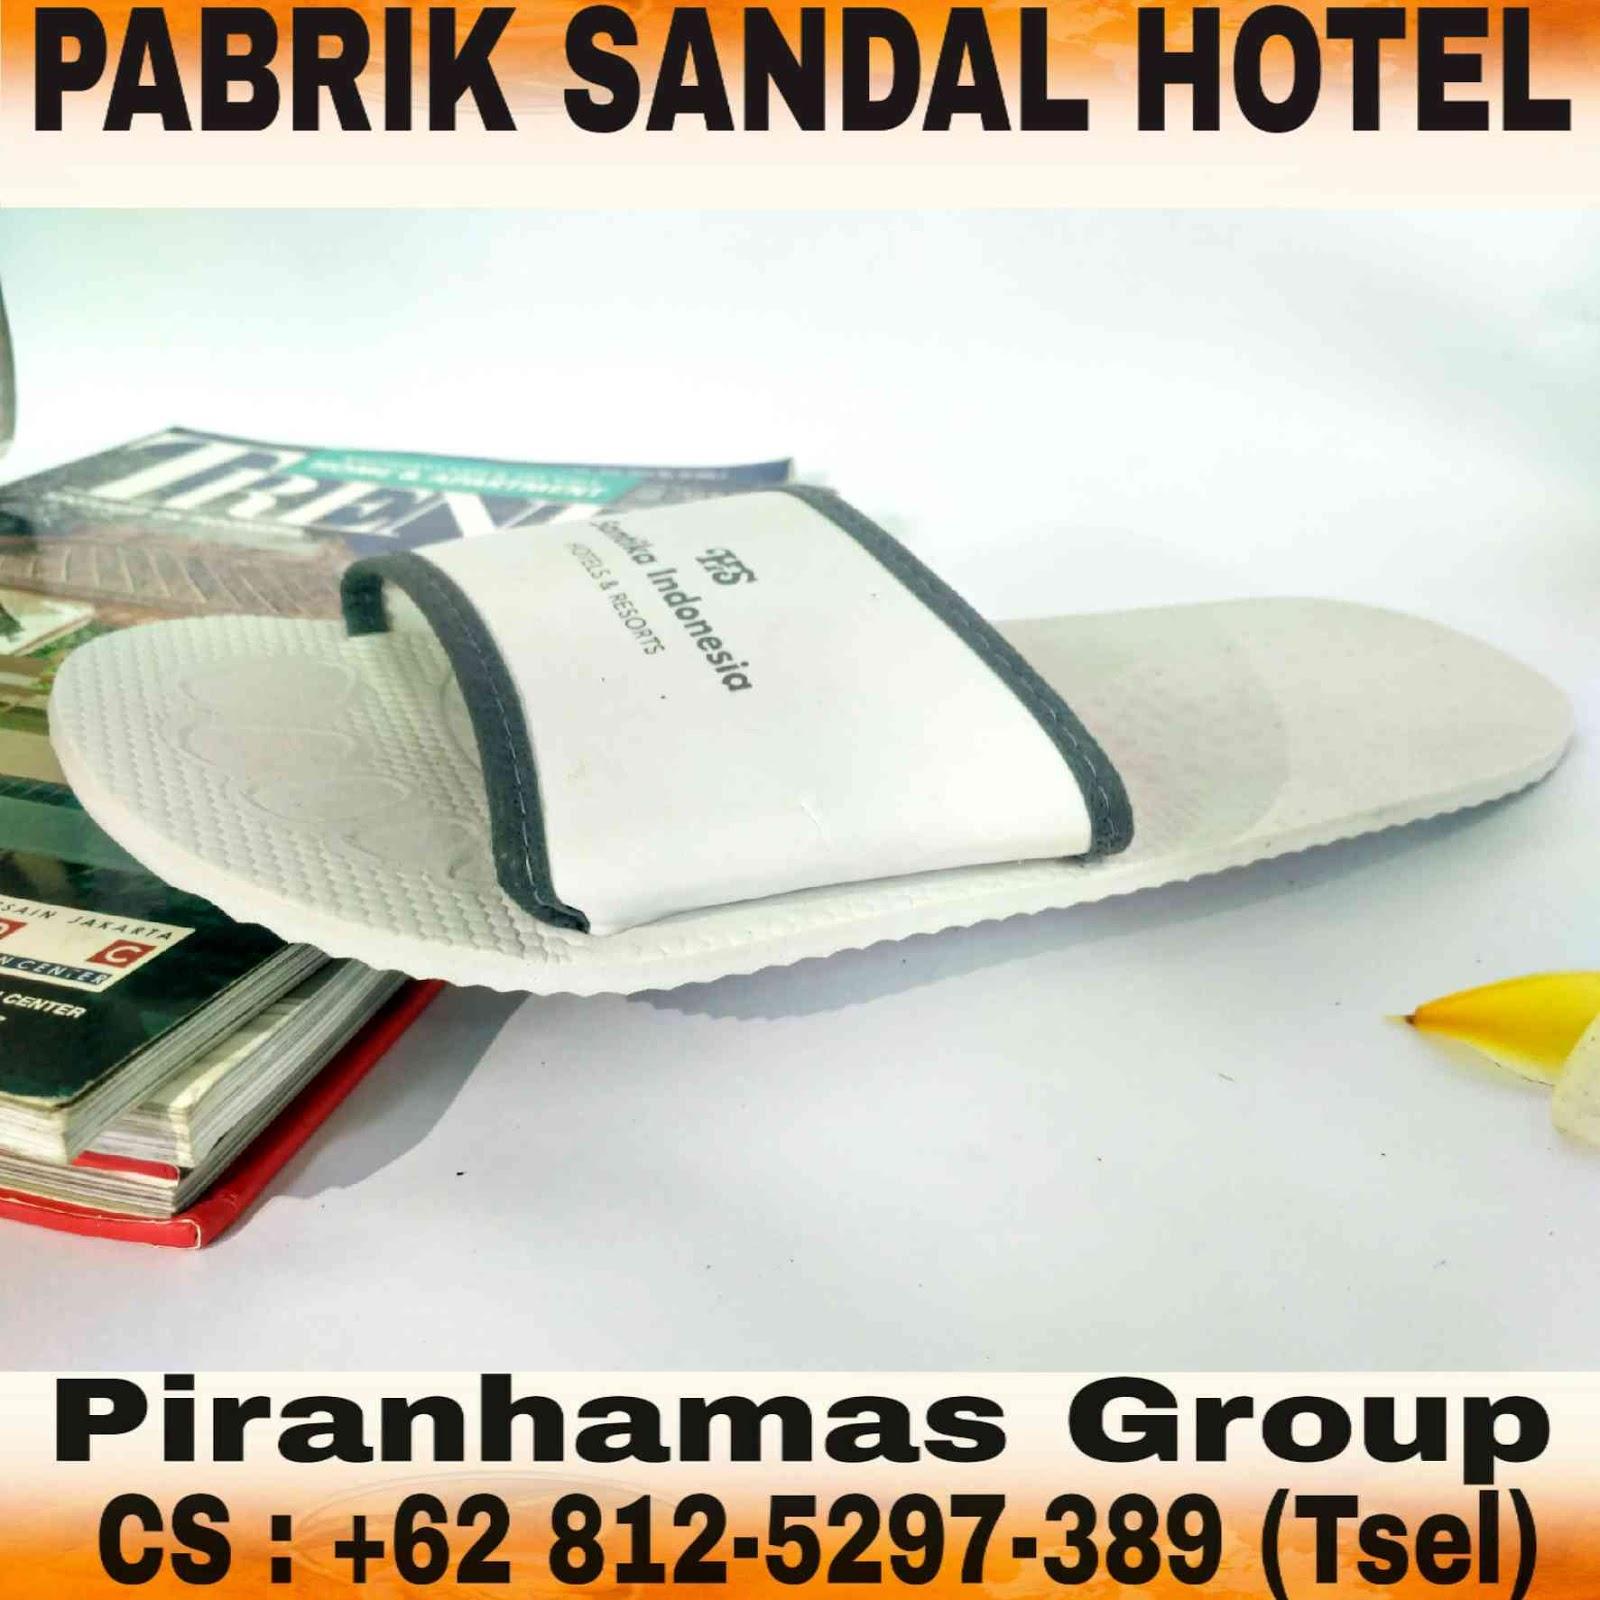 8d25e3ce0 Produksi Sandal Hotel Di Malang